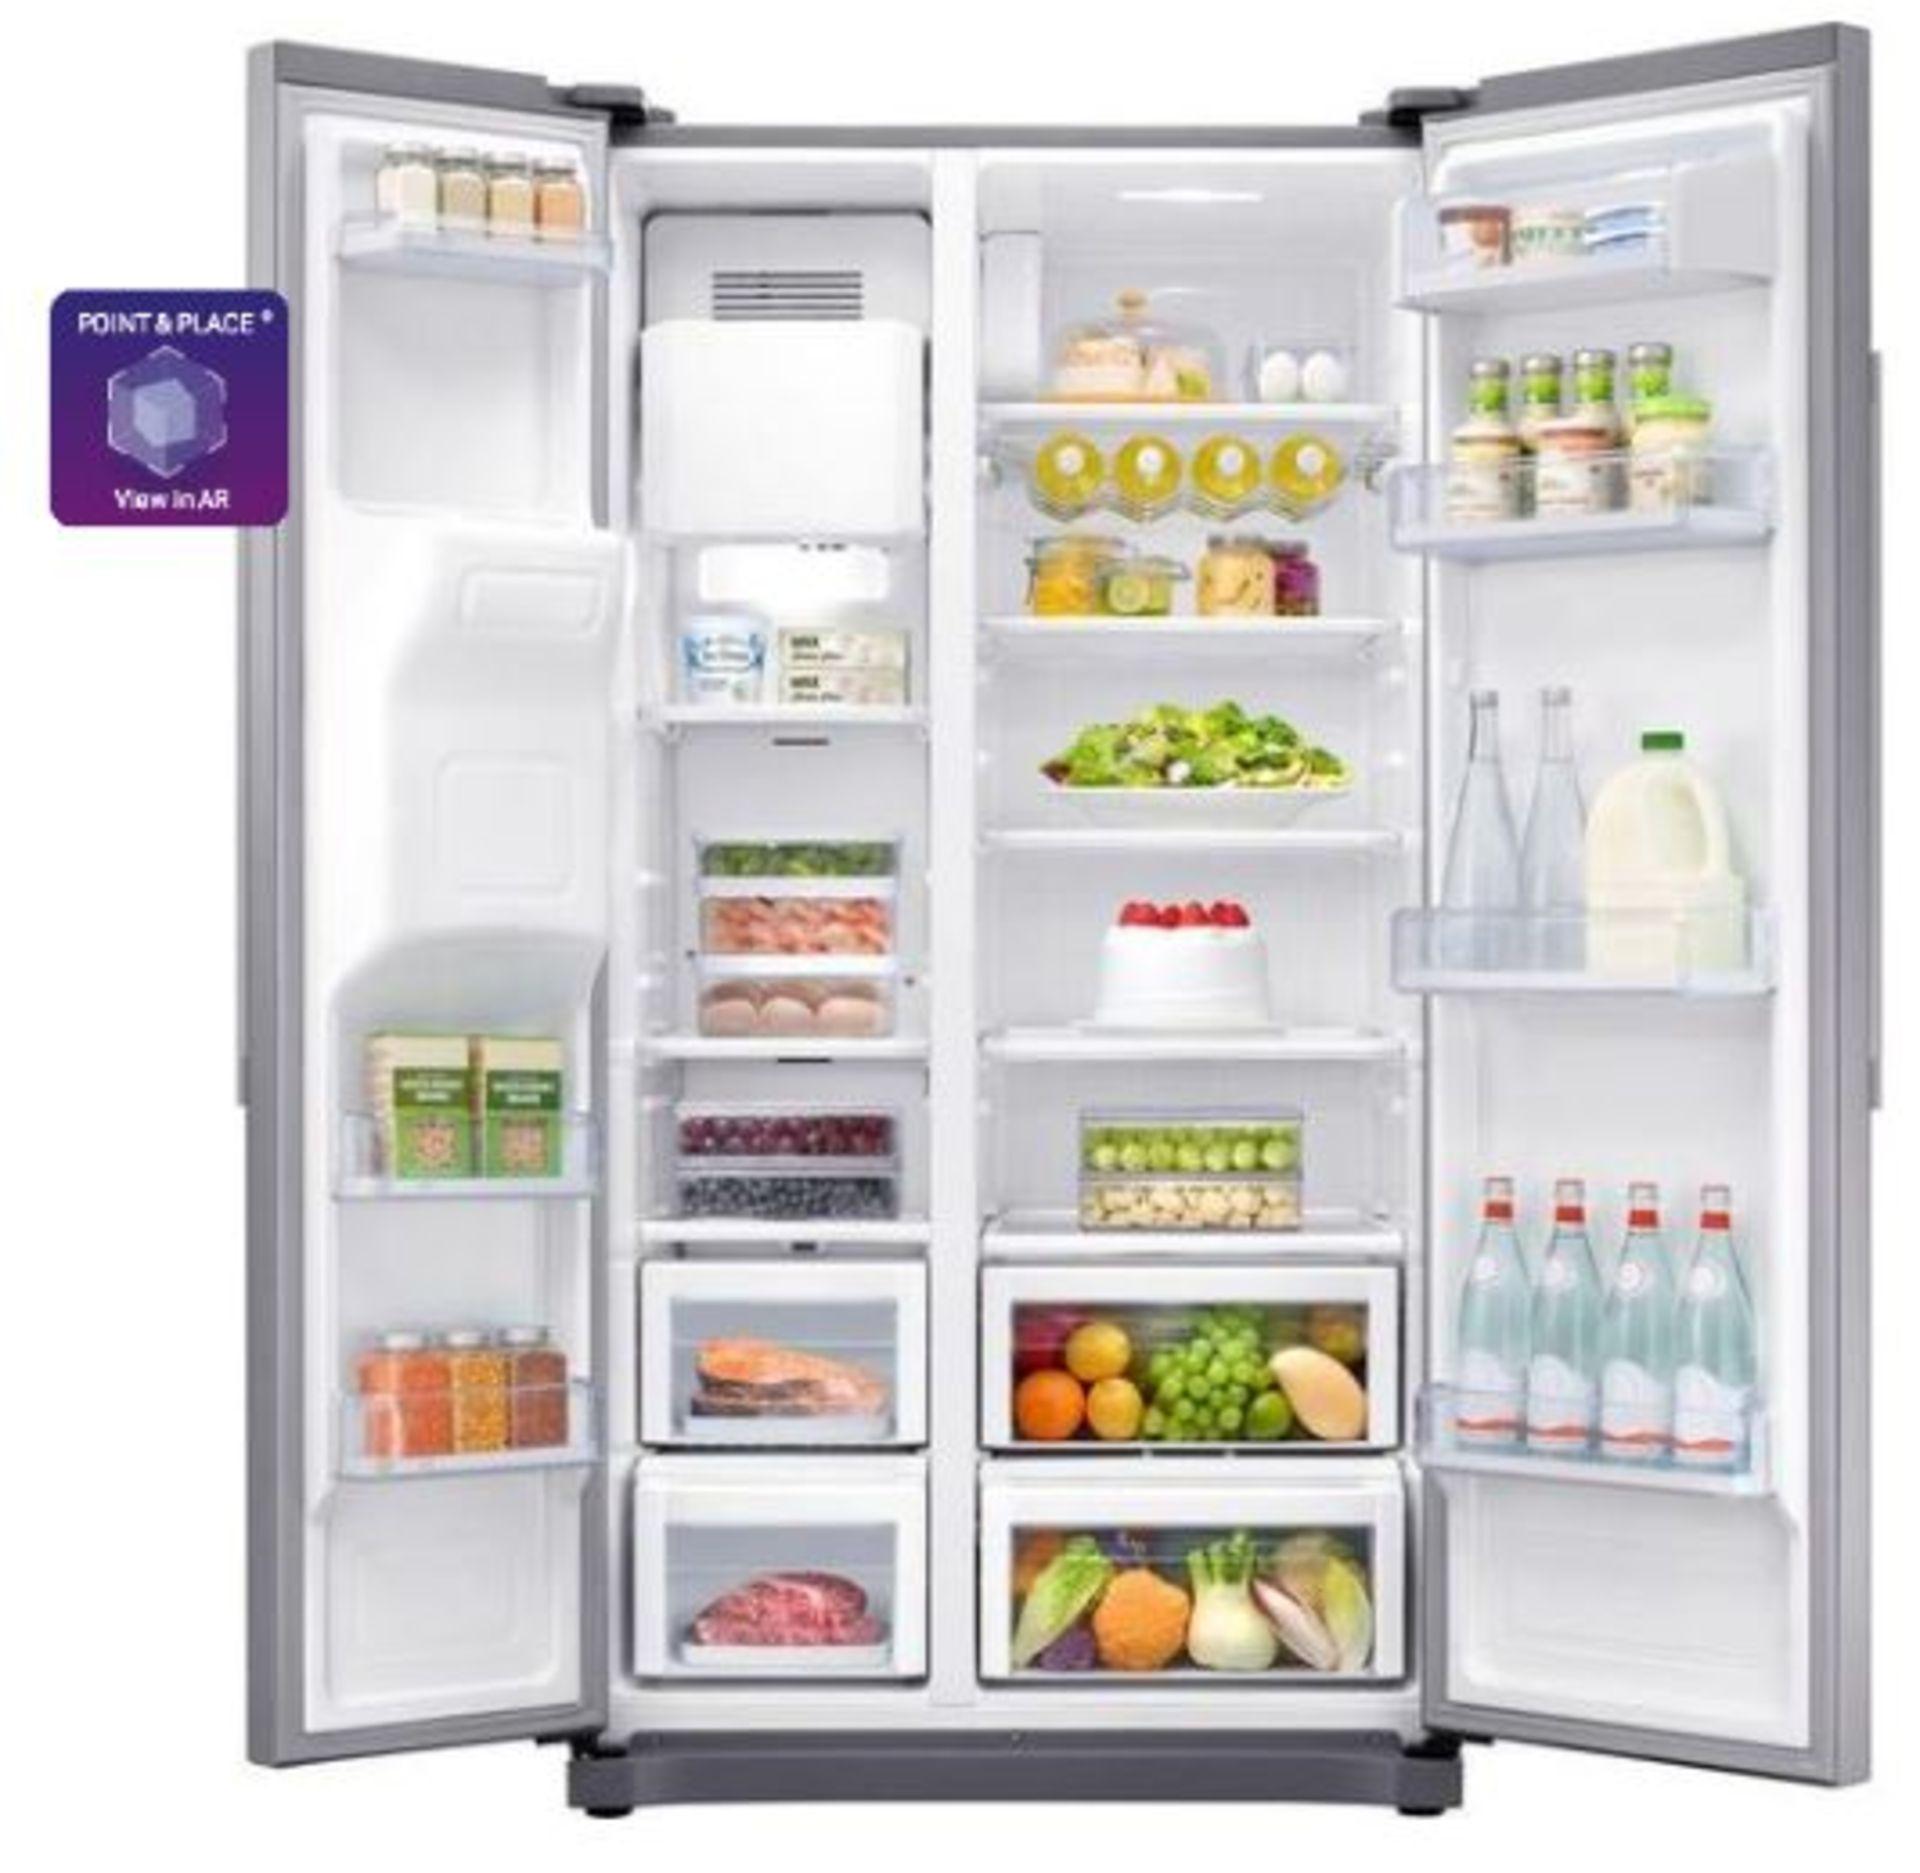 Pallet of 1 Samsung Water & Ice Fridge freezer. Latest selling price £929.99* - Image 2 of 9